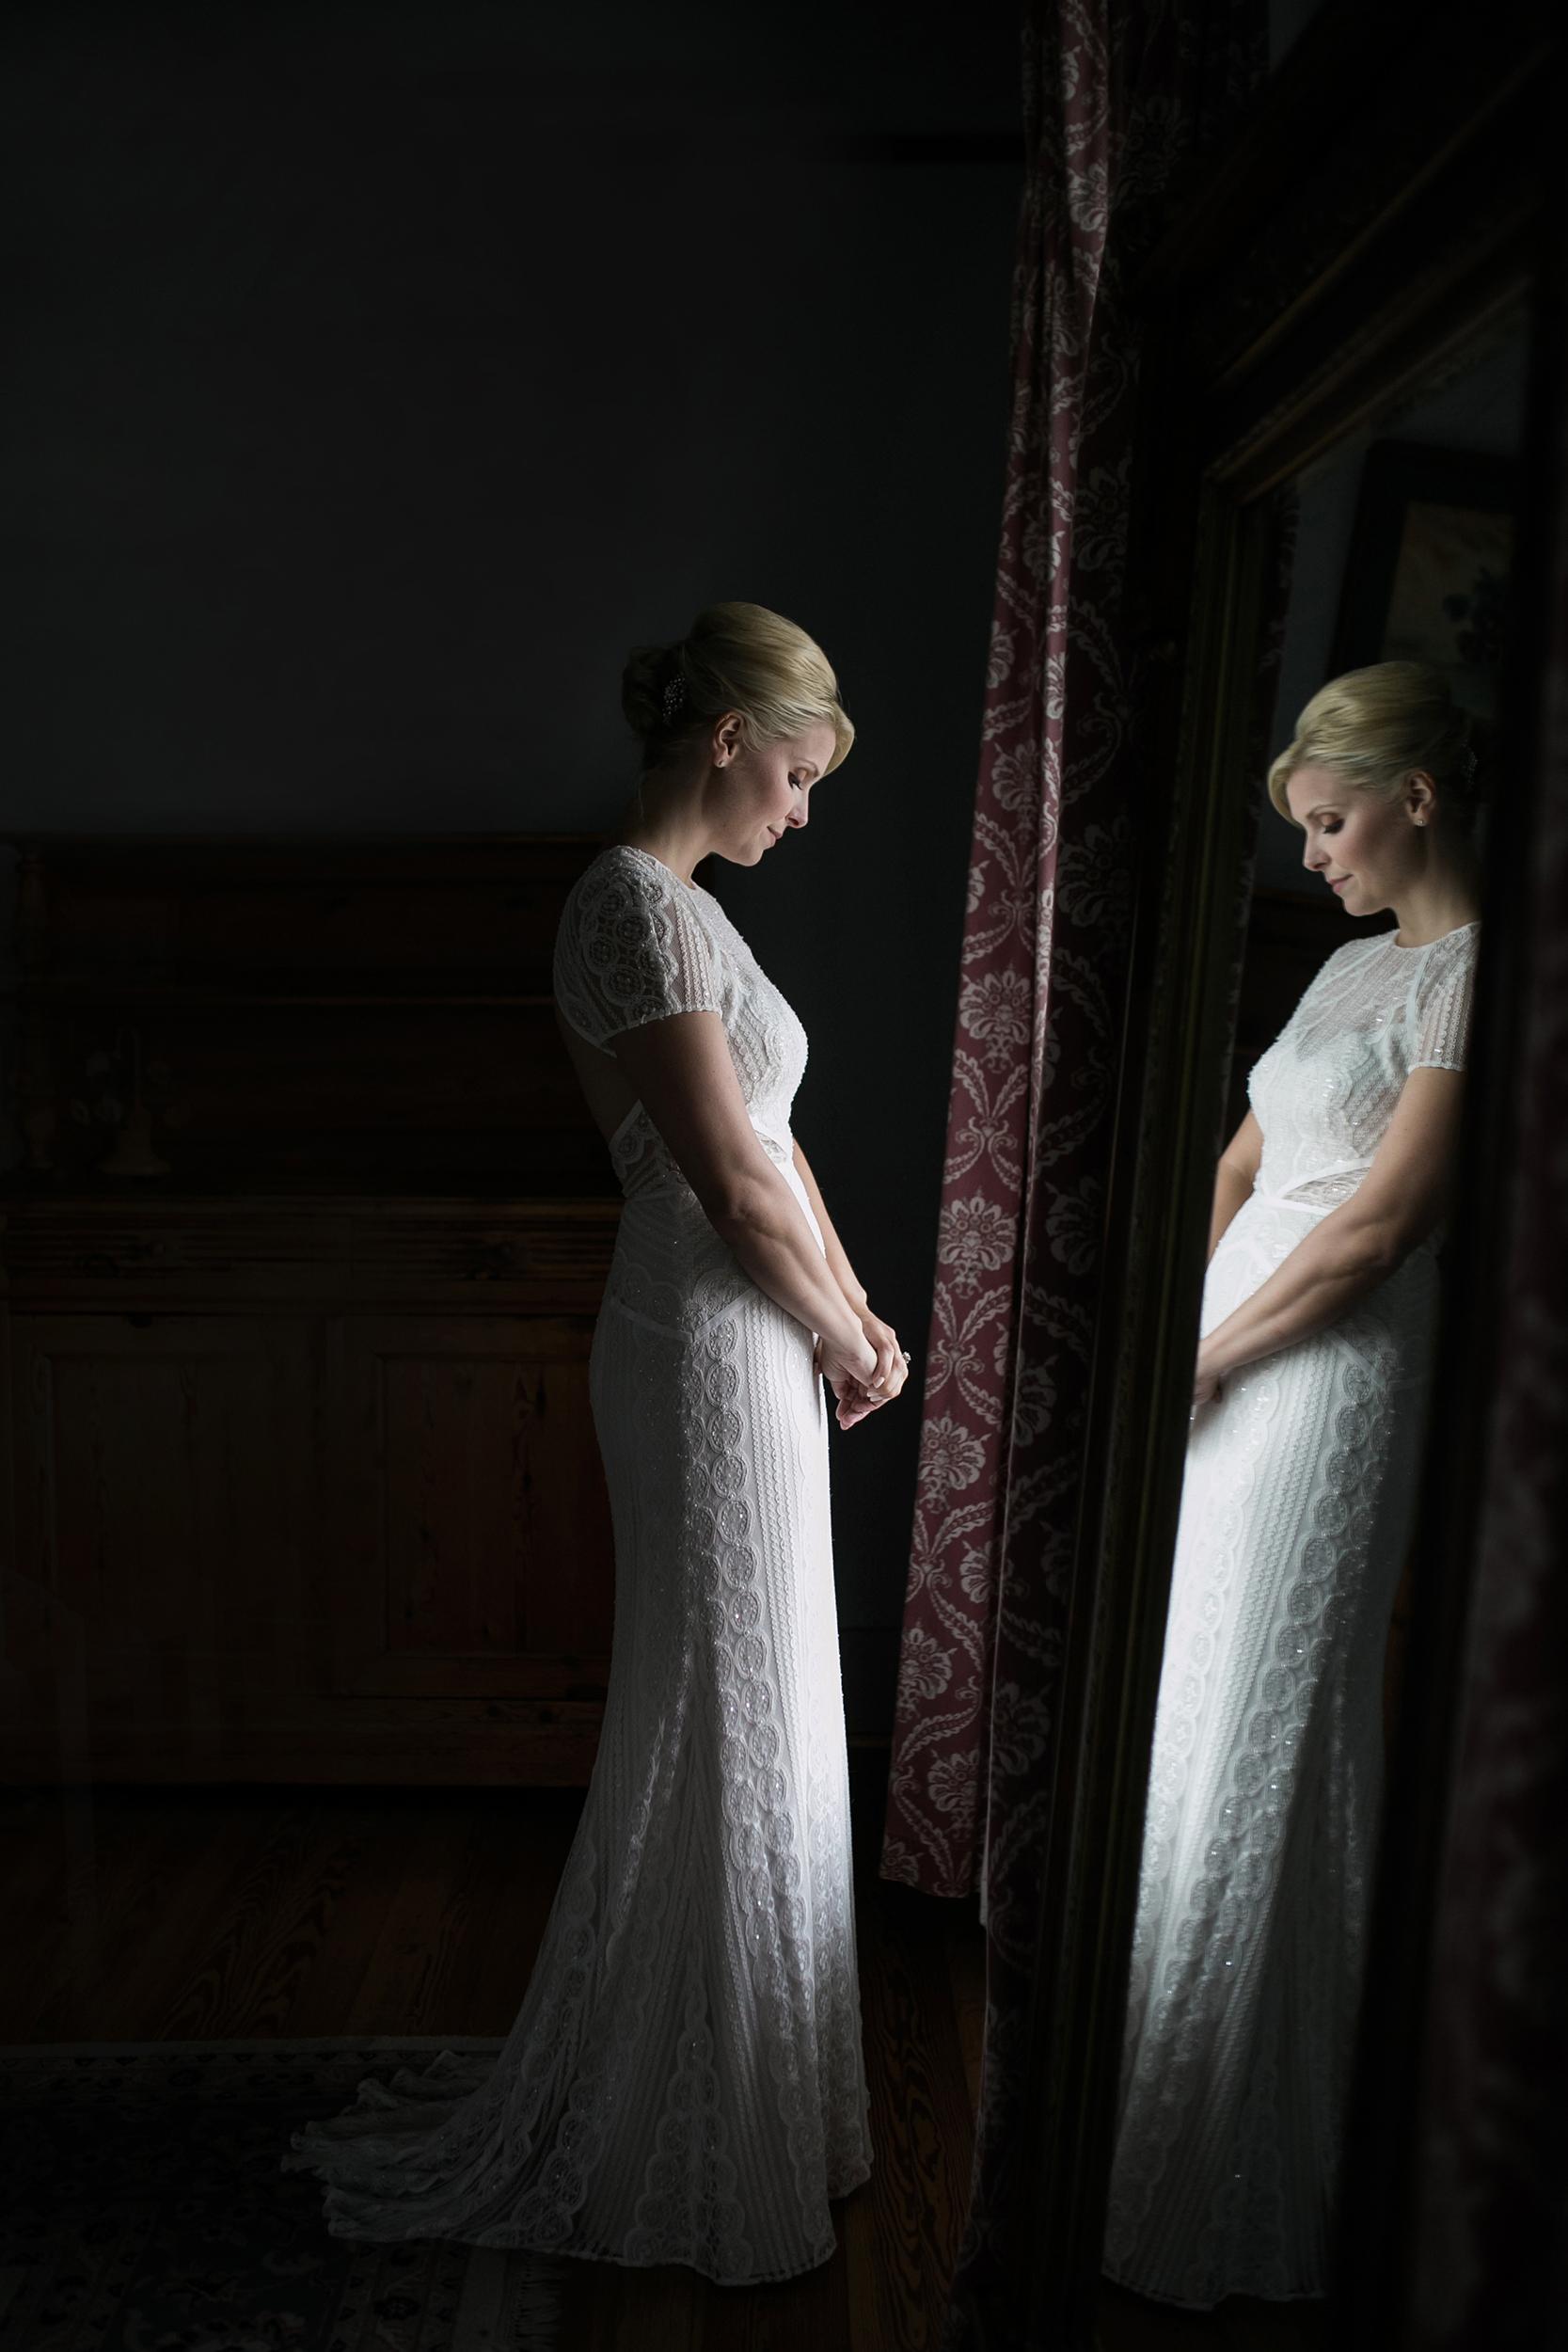 Austin_Wedding_Photographer_Kimberly_Brooke_Photographic_178.jpg